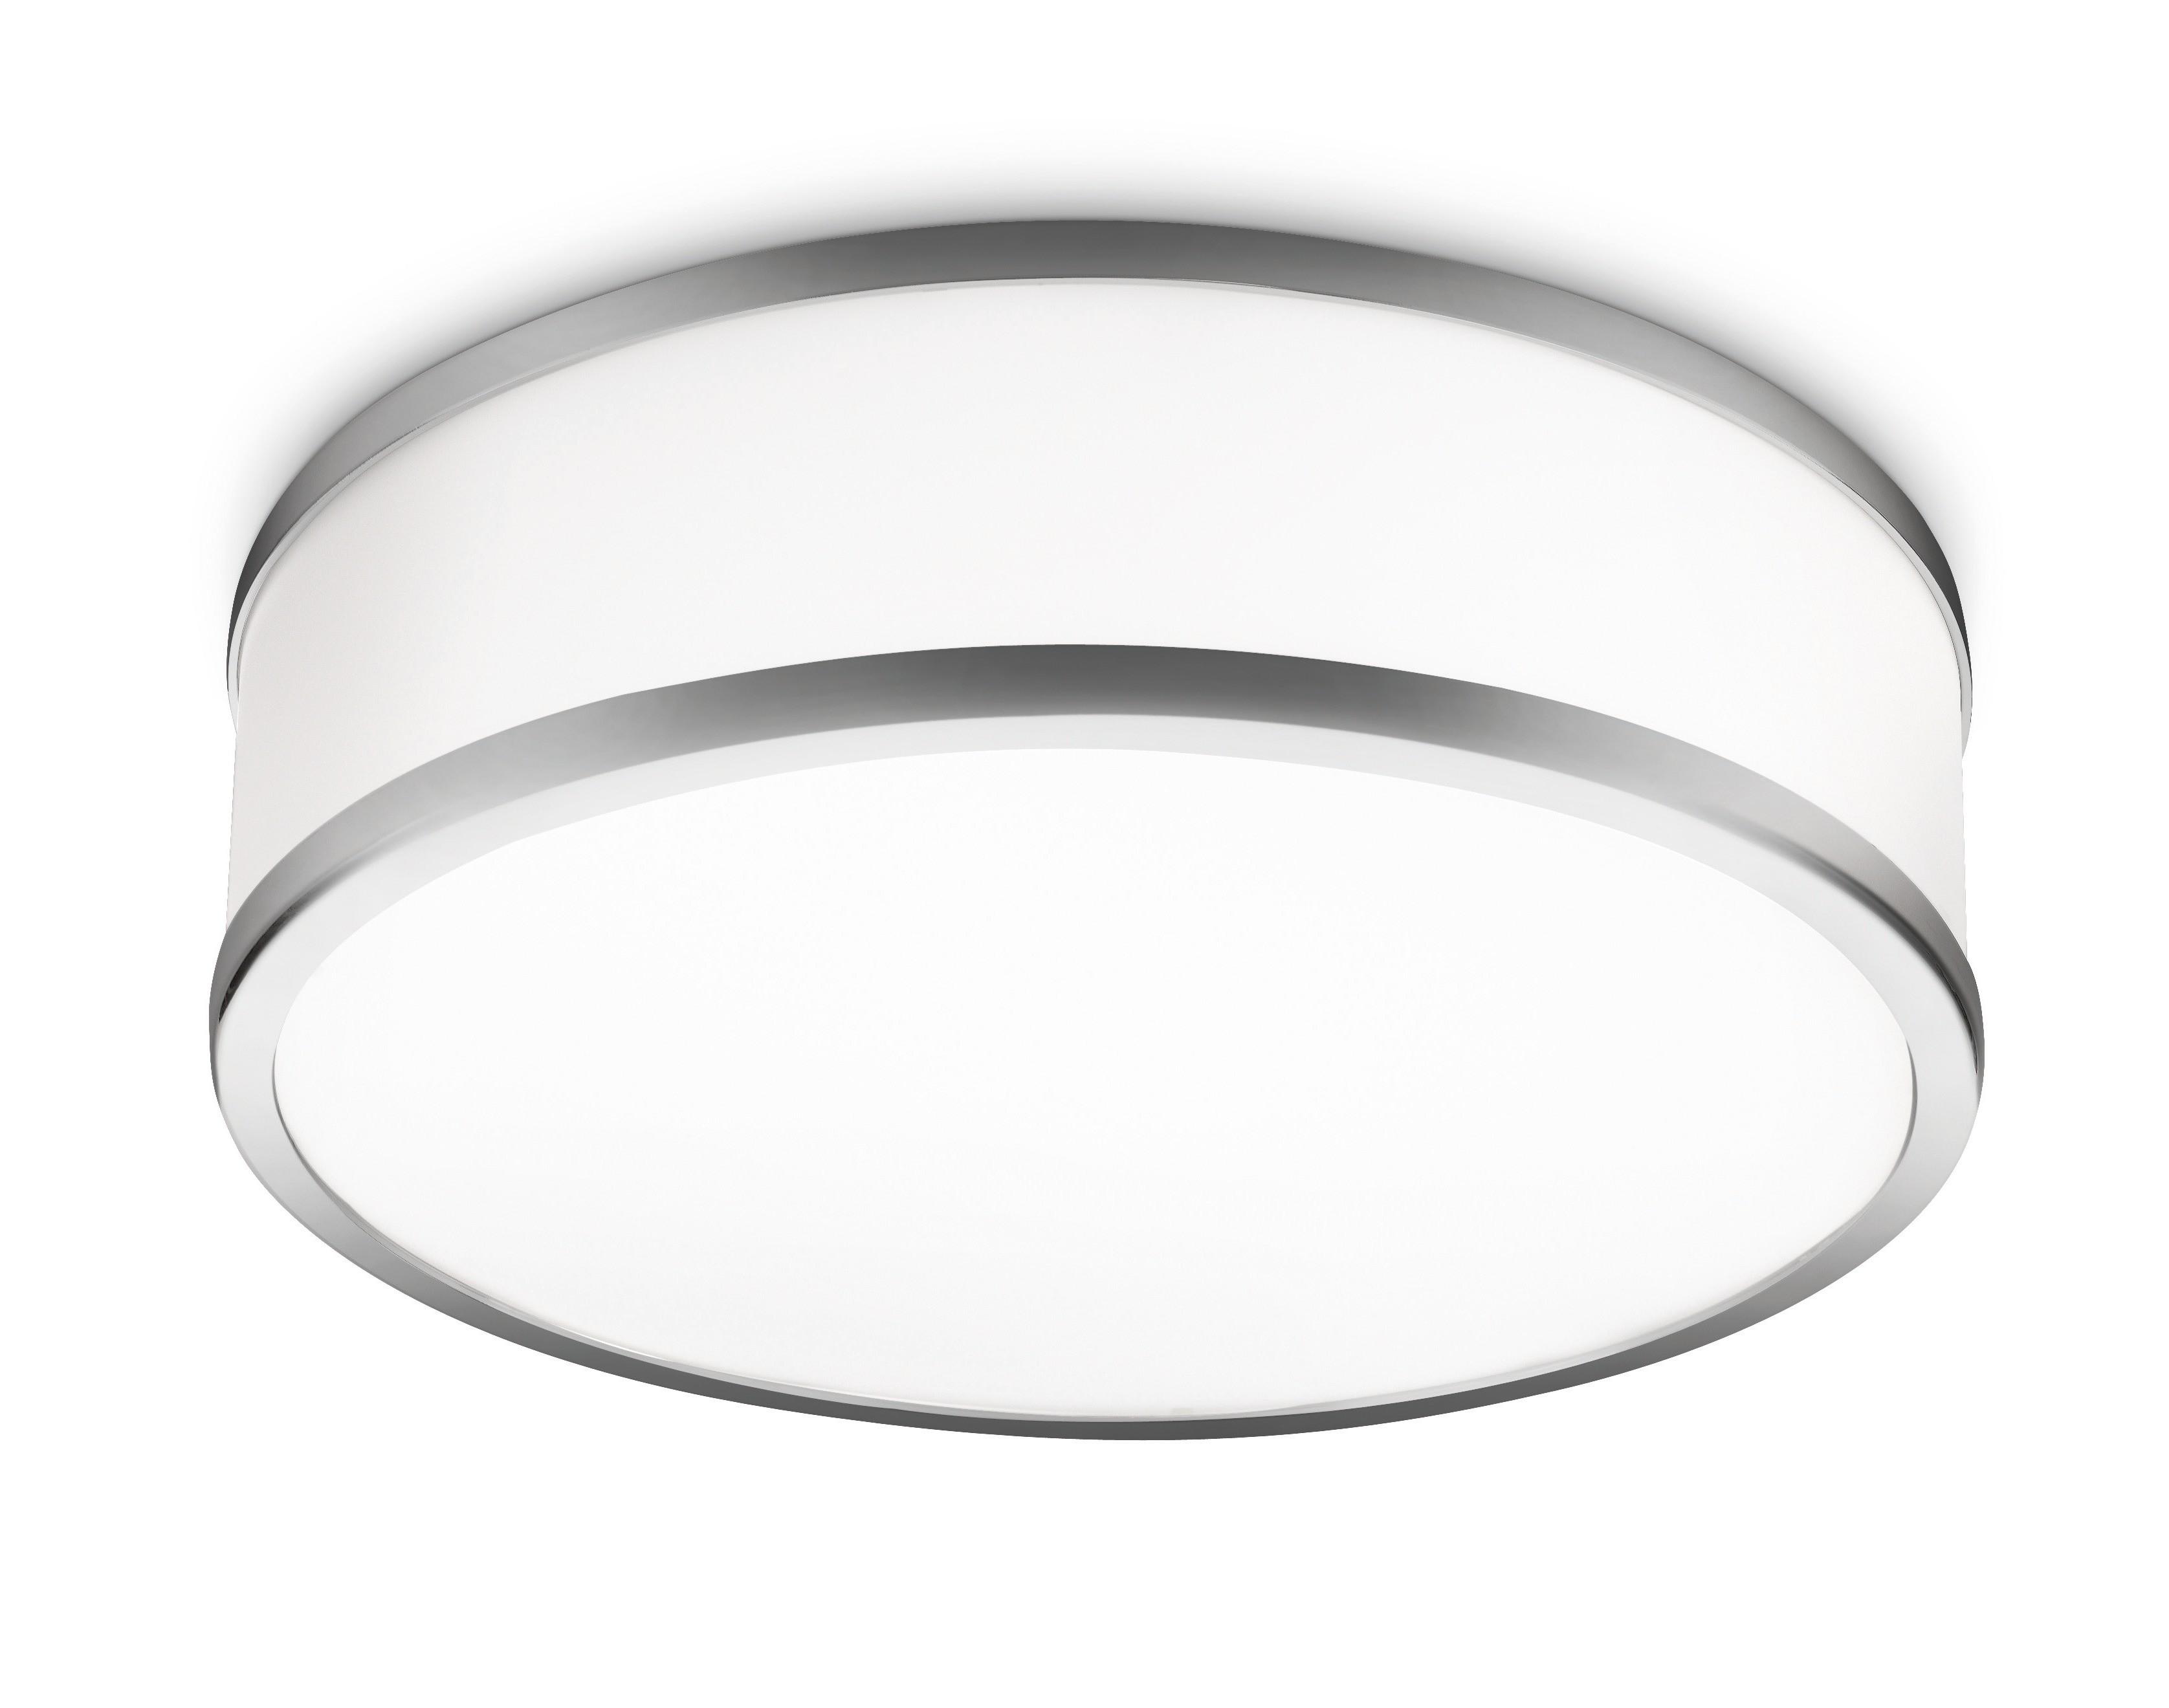 Philips Mybathroom Dew 320541116 Plafondlamp